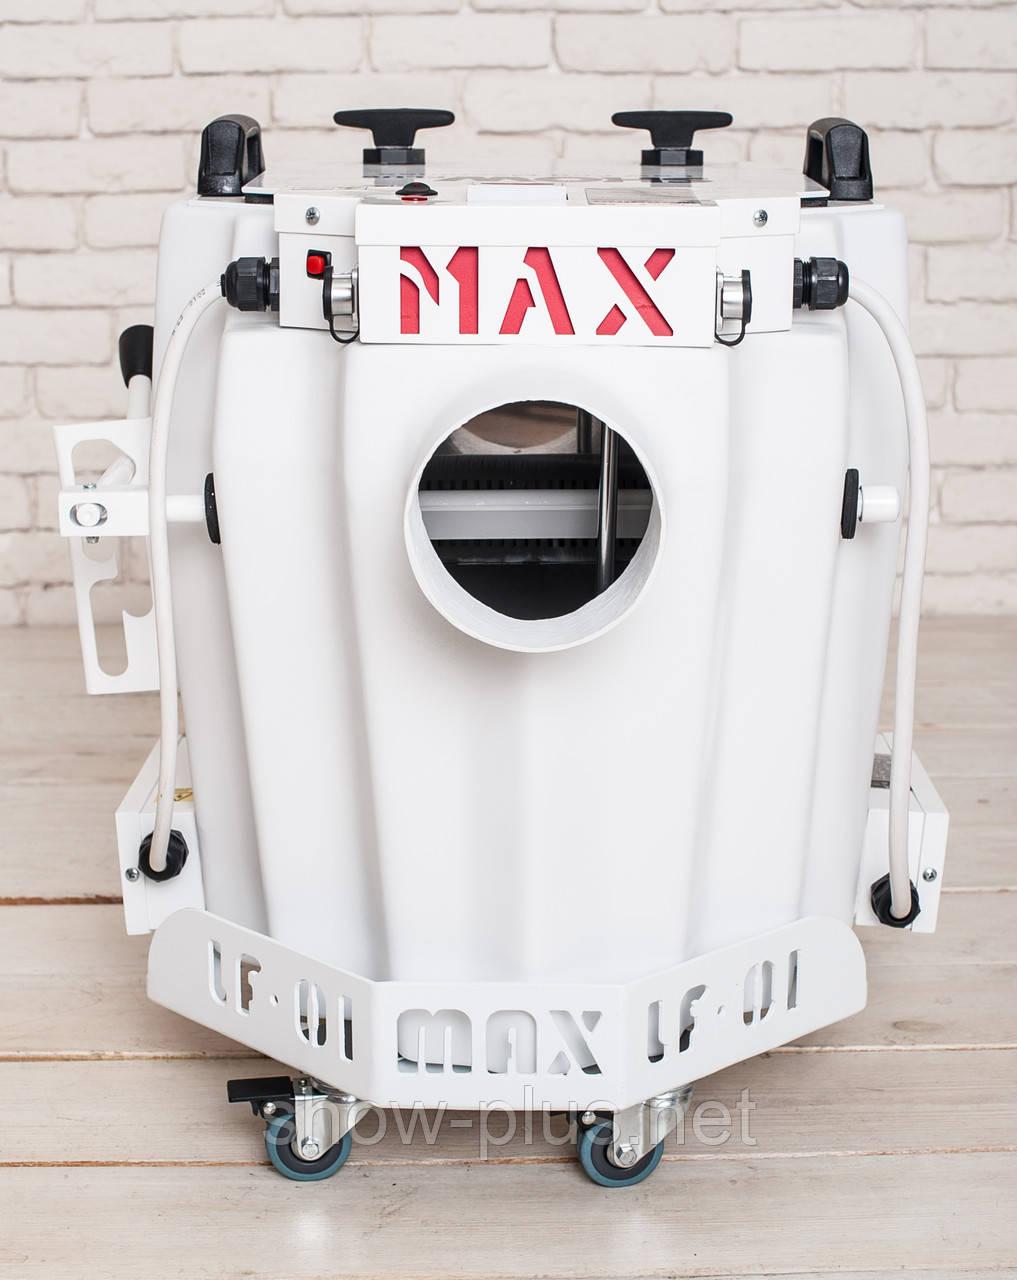 Генератор важкого диму / Генератор тяжелого низкого дыма SHOWplus LF-01 MAX Euro (White Edition)